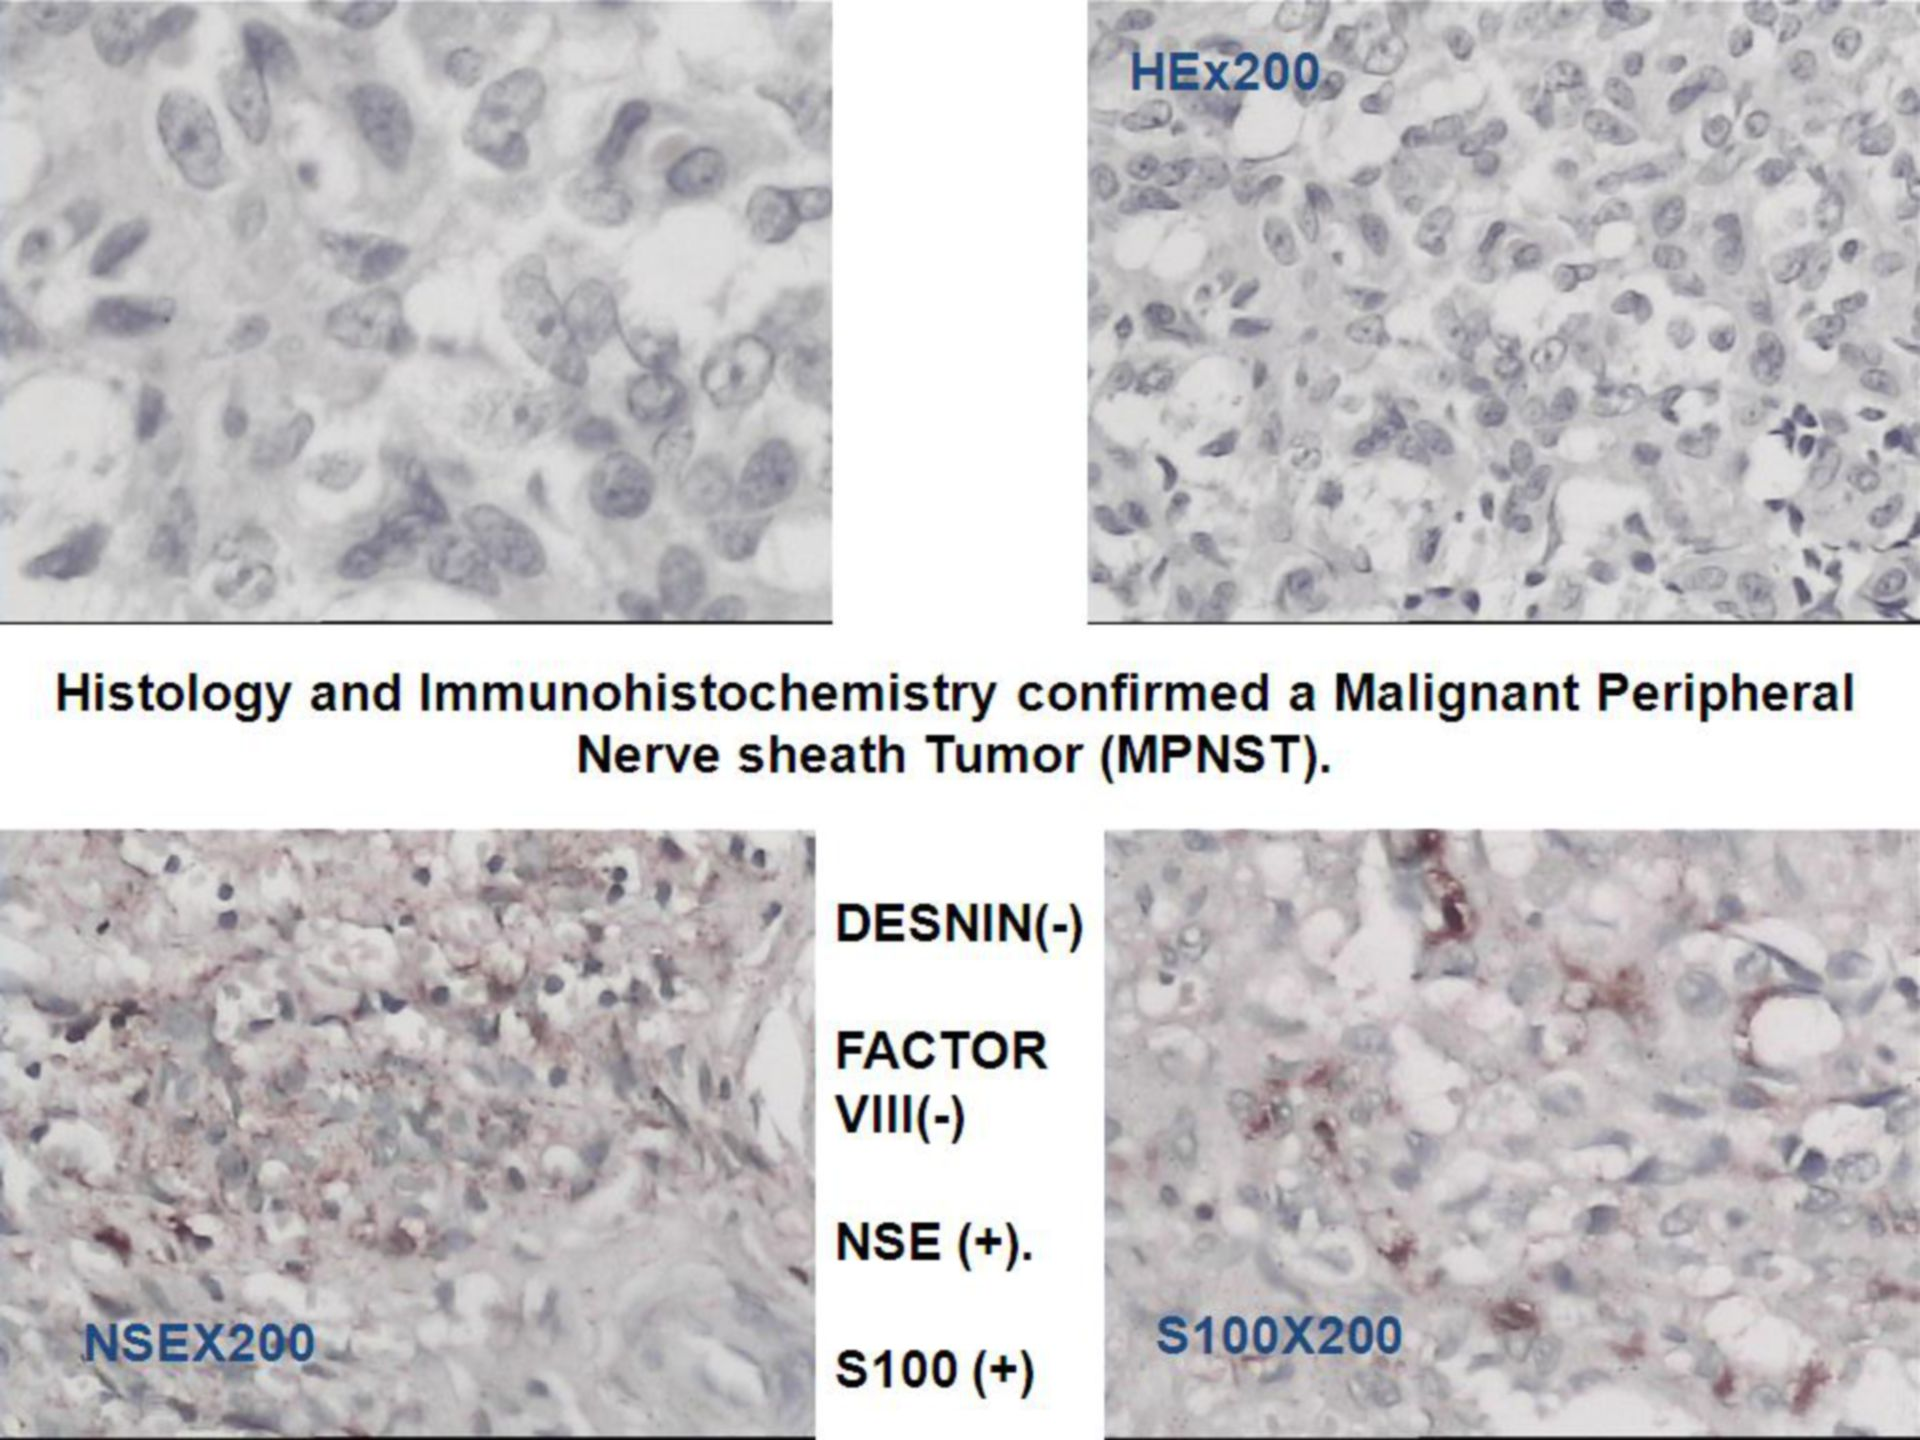 Tumor de la vaina nerviosa periférica/Neurofibromatosis tipo 1